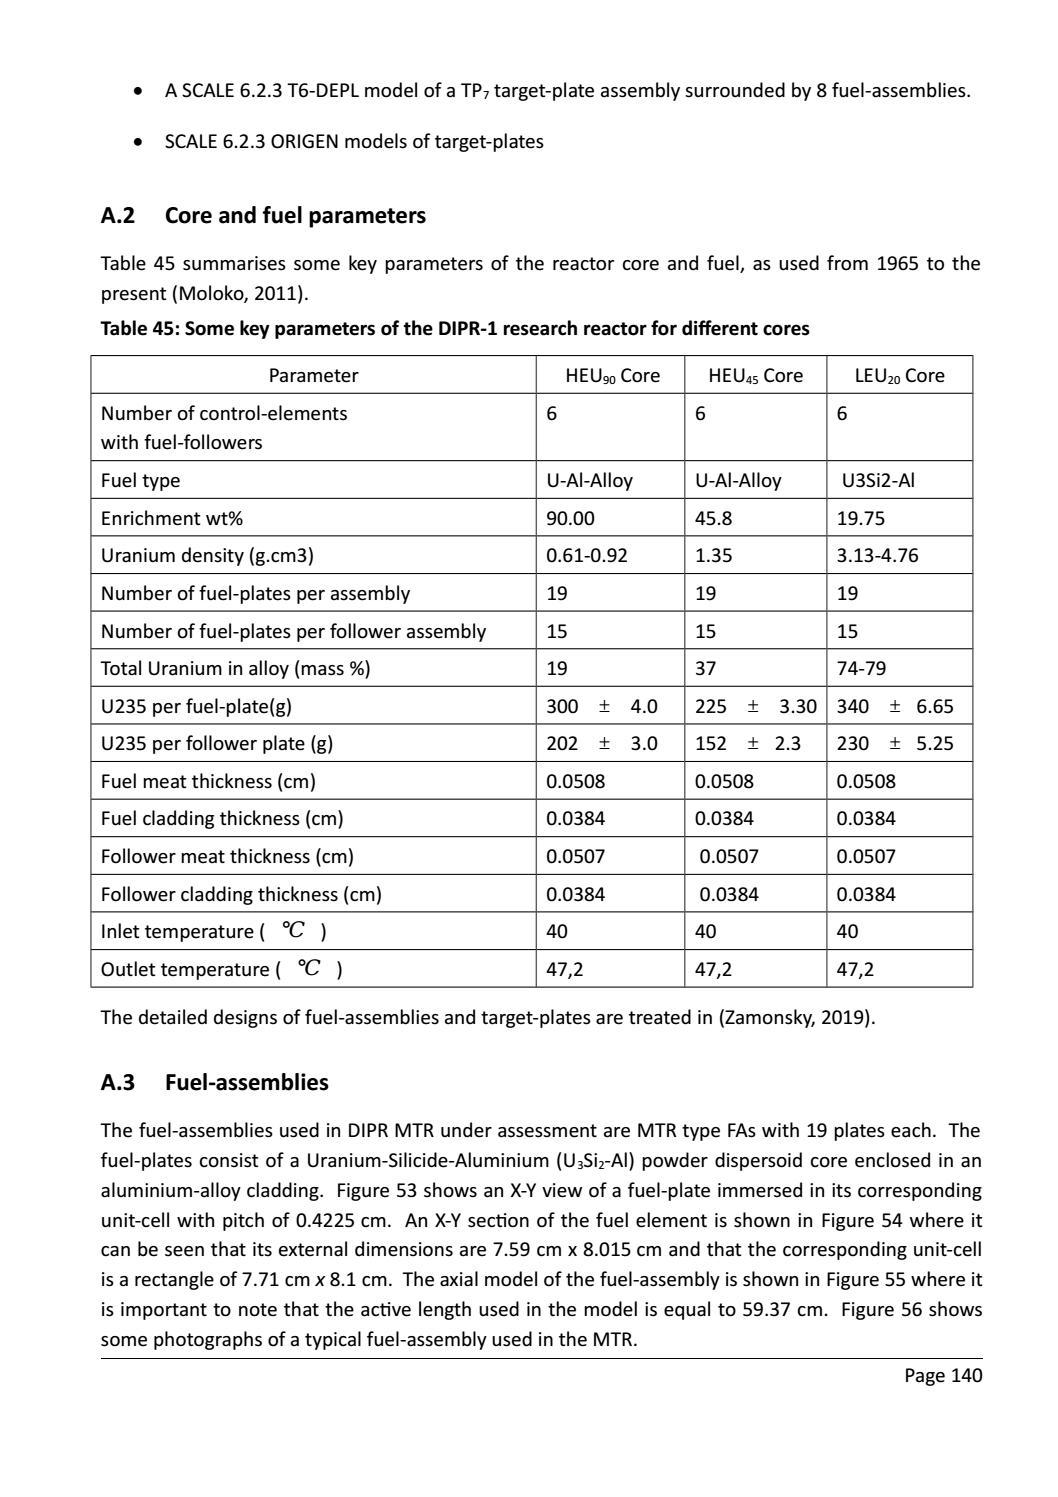 RADIOACTIVE WASTE: COMPUTATIONAL CHARACTERISATION and SHIELDING page 165